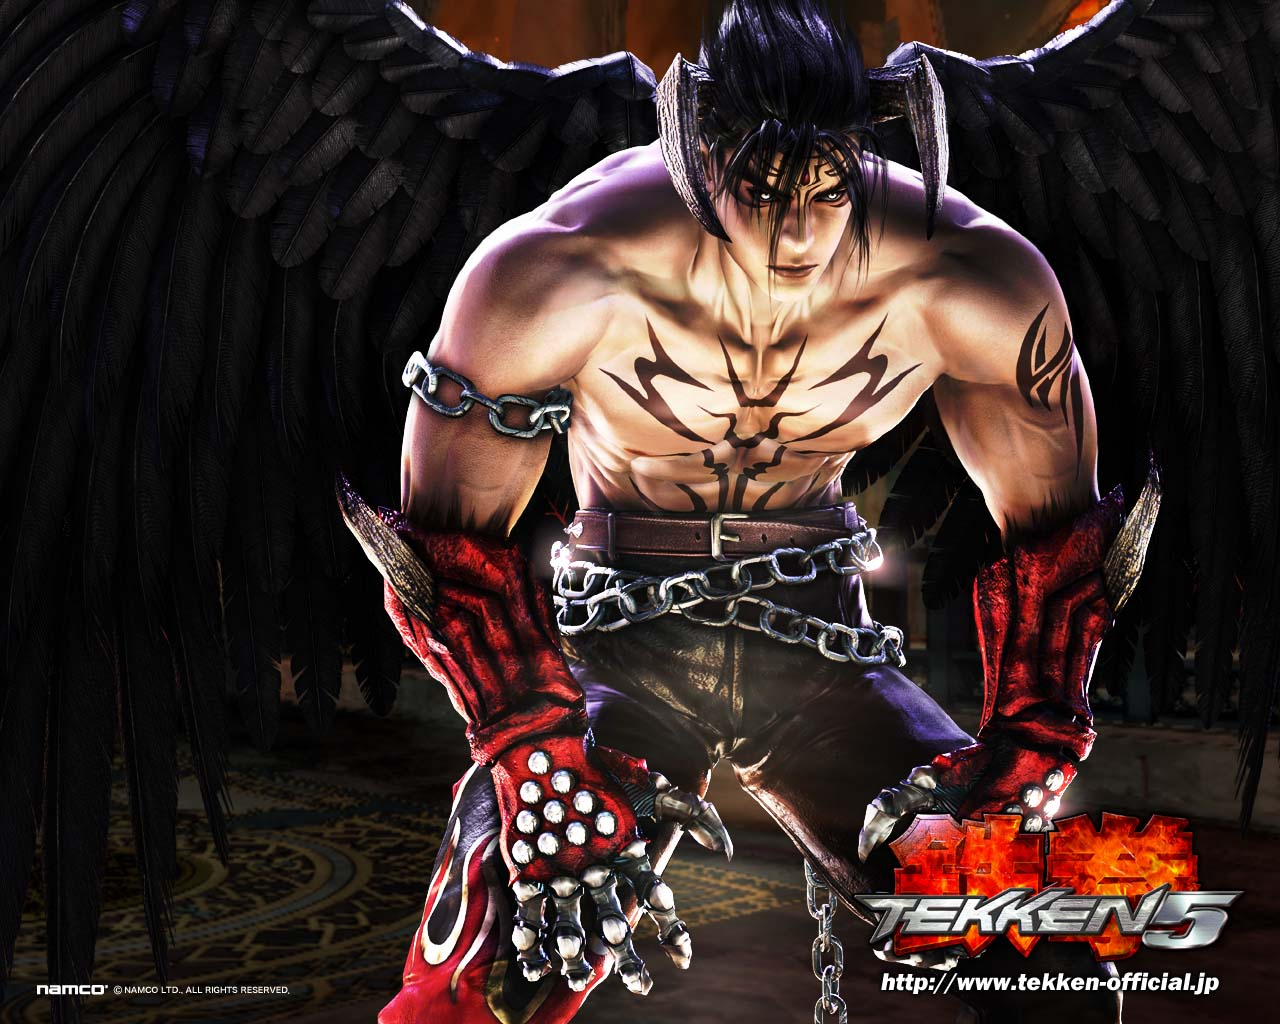 50 Tekken 5 Wallpaper On Wallpapersafari